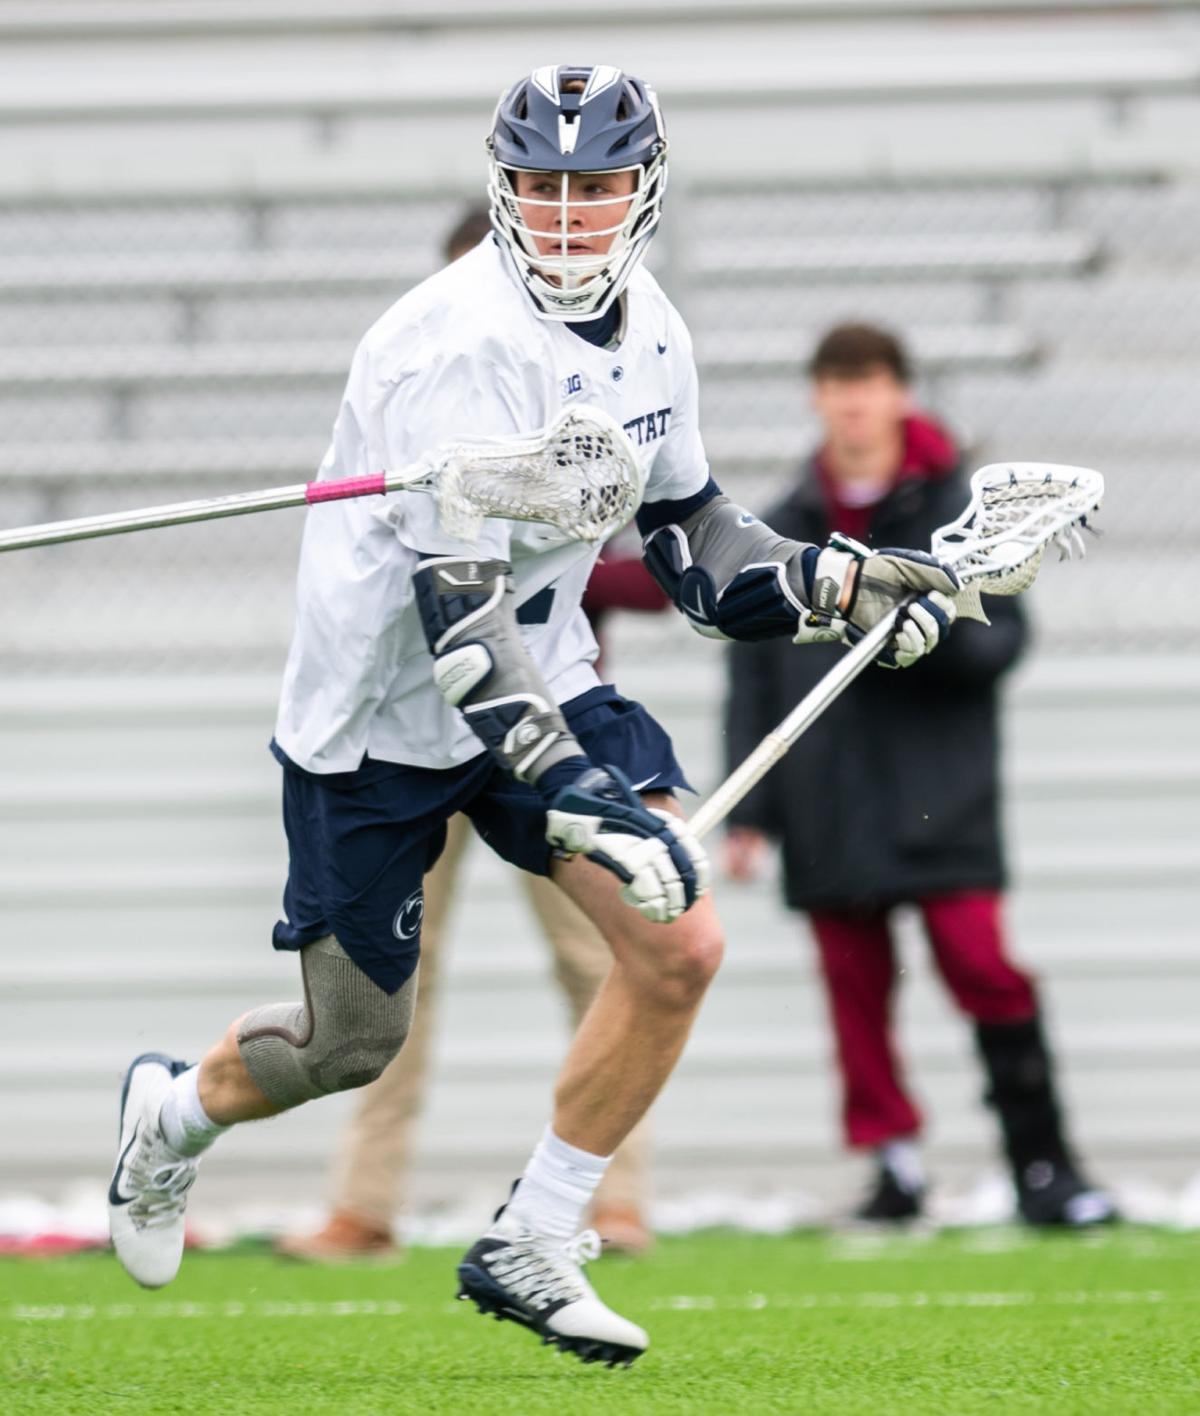 Penn State men's lacrosse vs Lafayette, TJ Malone (7)